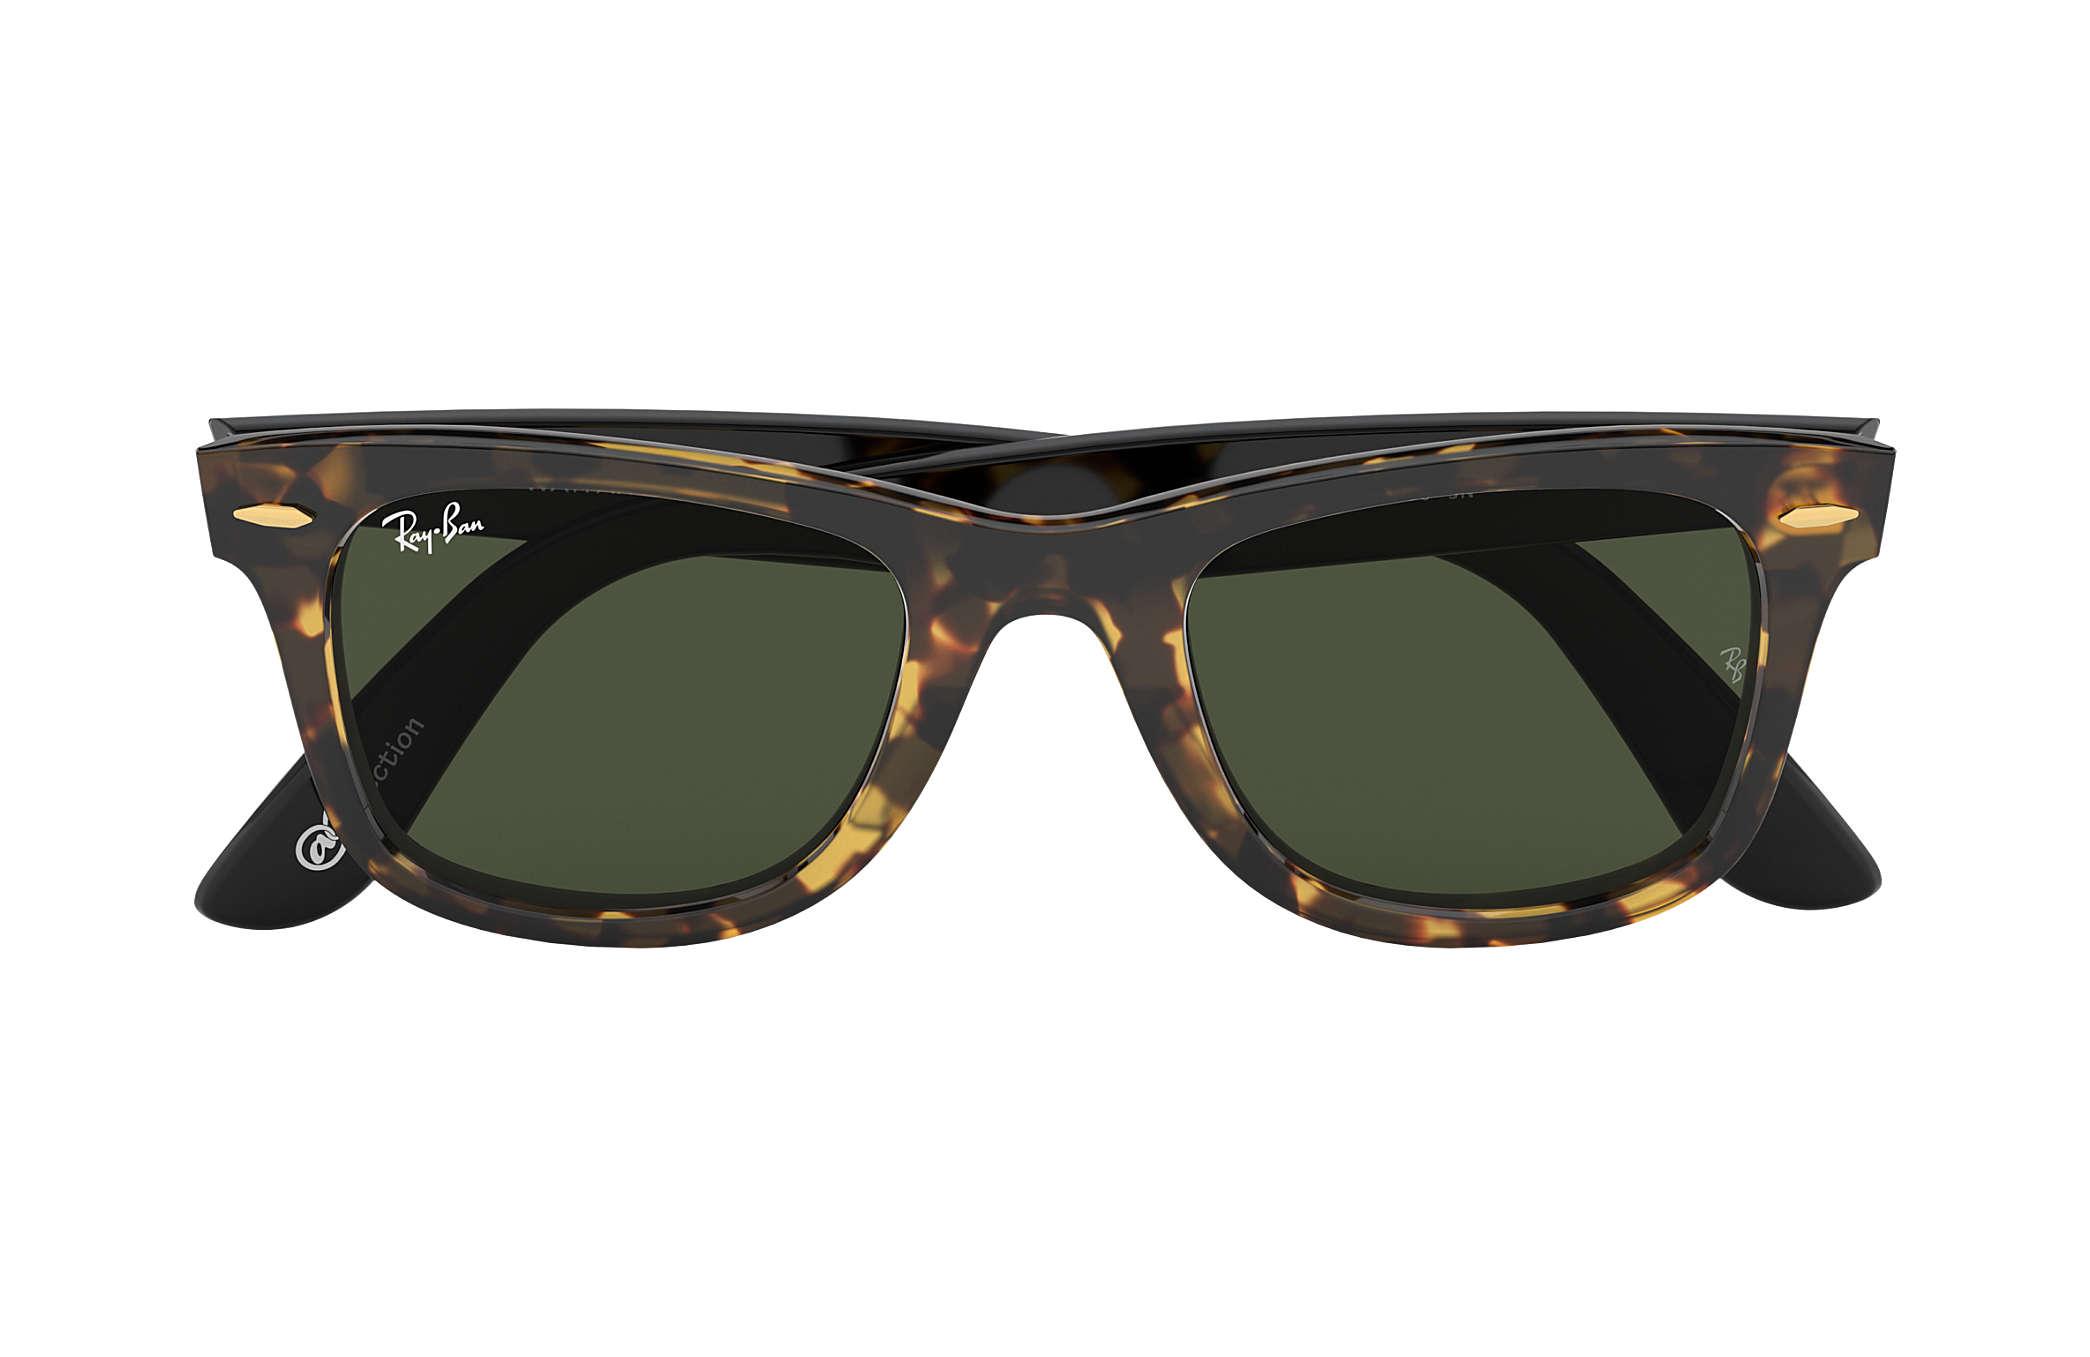 ... Ray-Ban 0RB2140-ORIGINAL WAYFARER  Collection Tortoise  Black SUN ... 6d1e2779dd